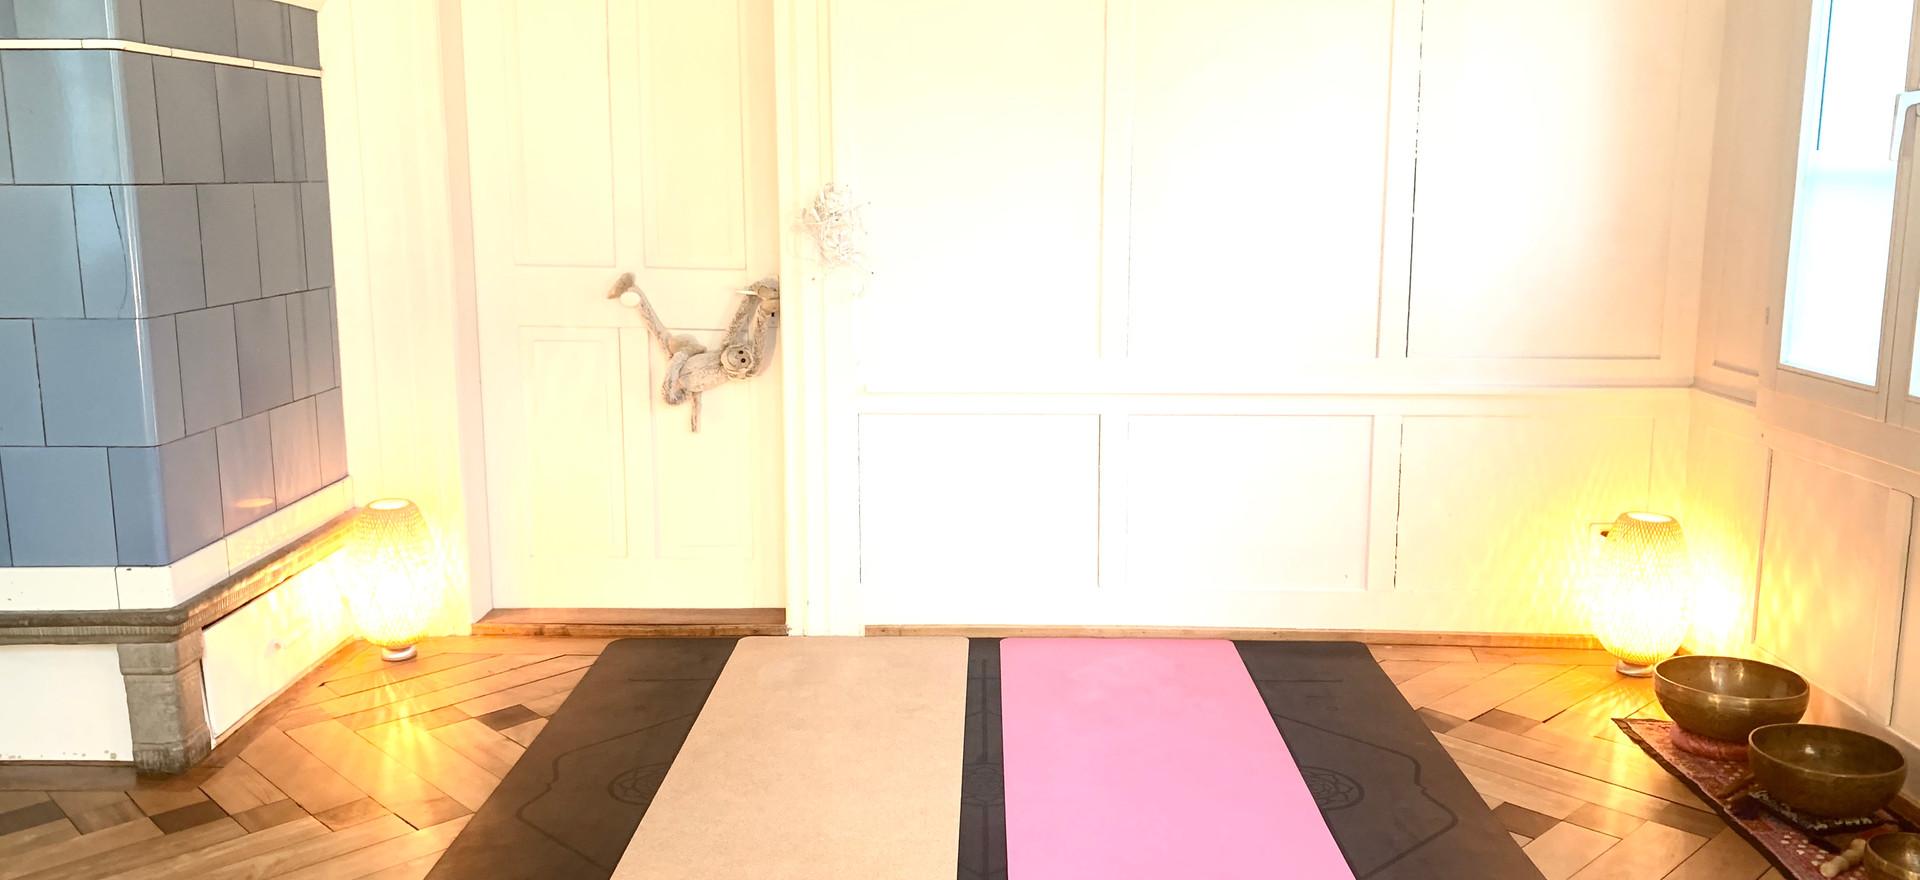 Das online Yogastudio